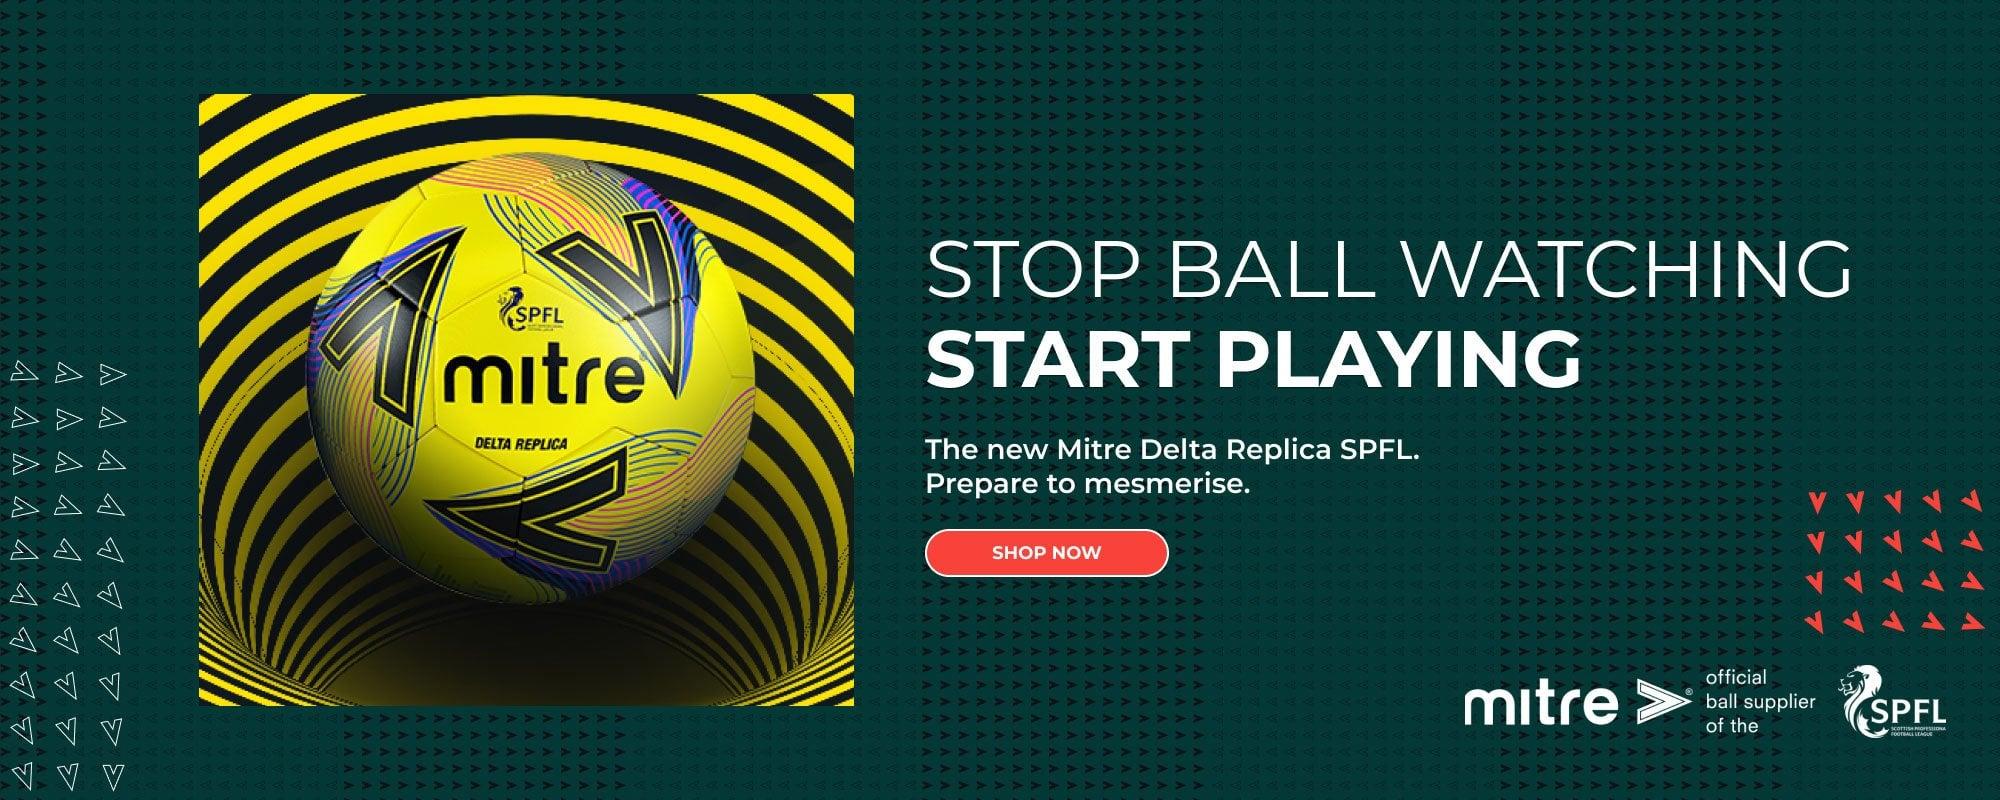 SPFL Balls